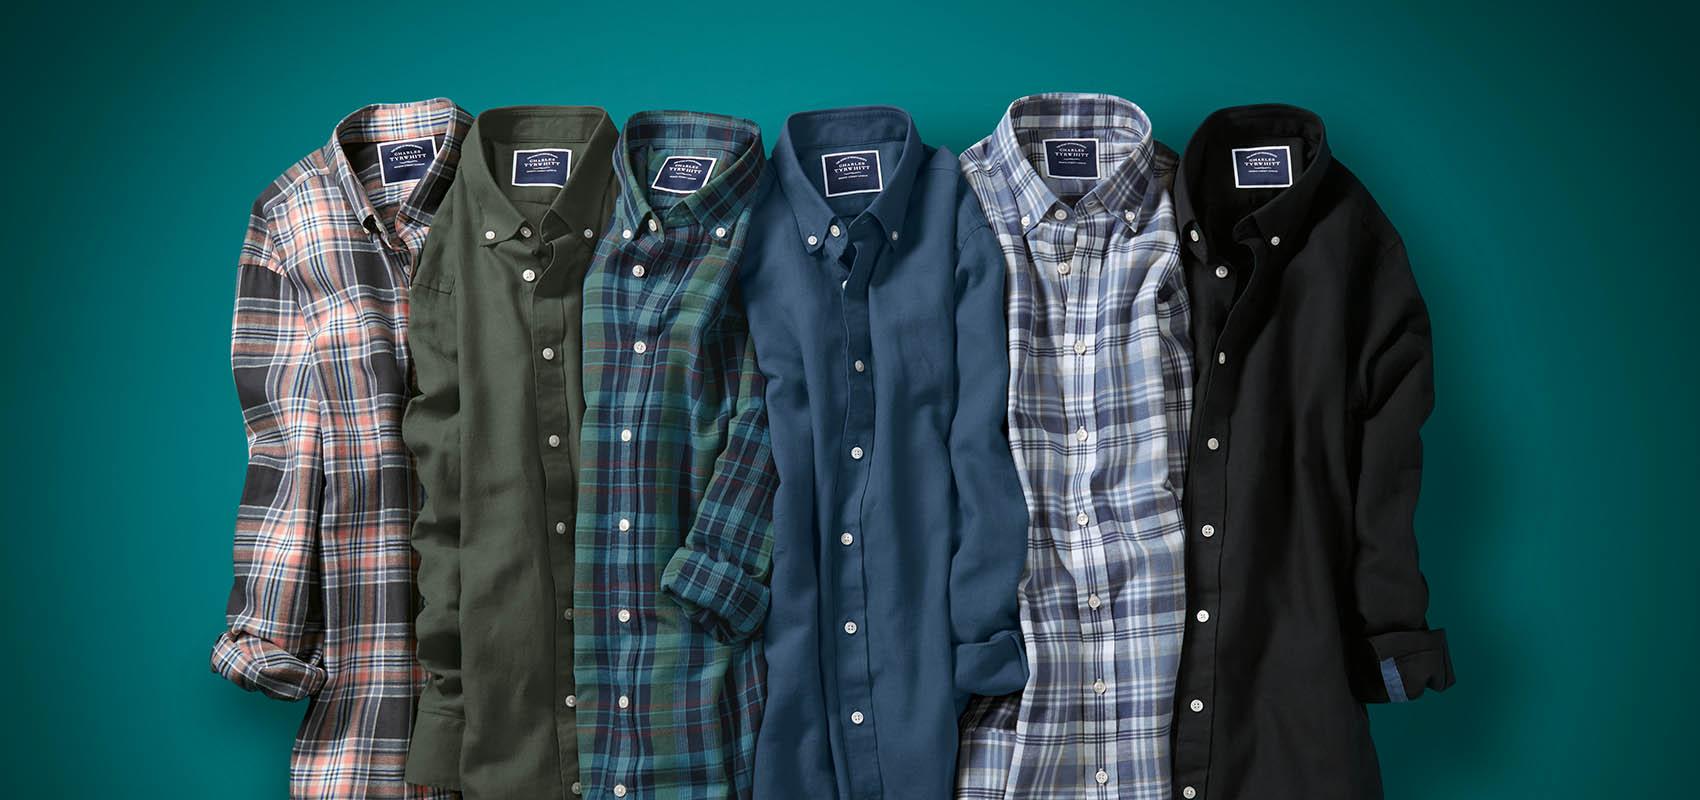 Charles Tyrwhitt Cotton Linen Shirts